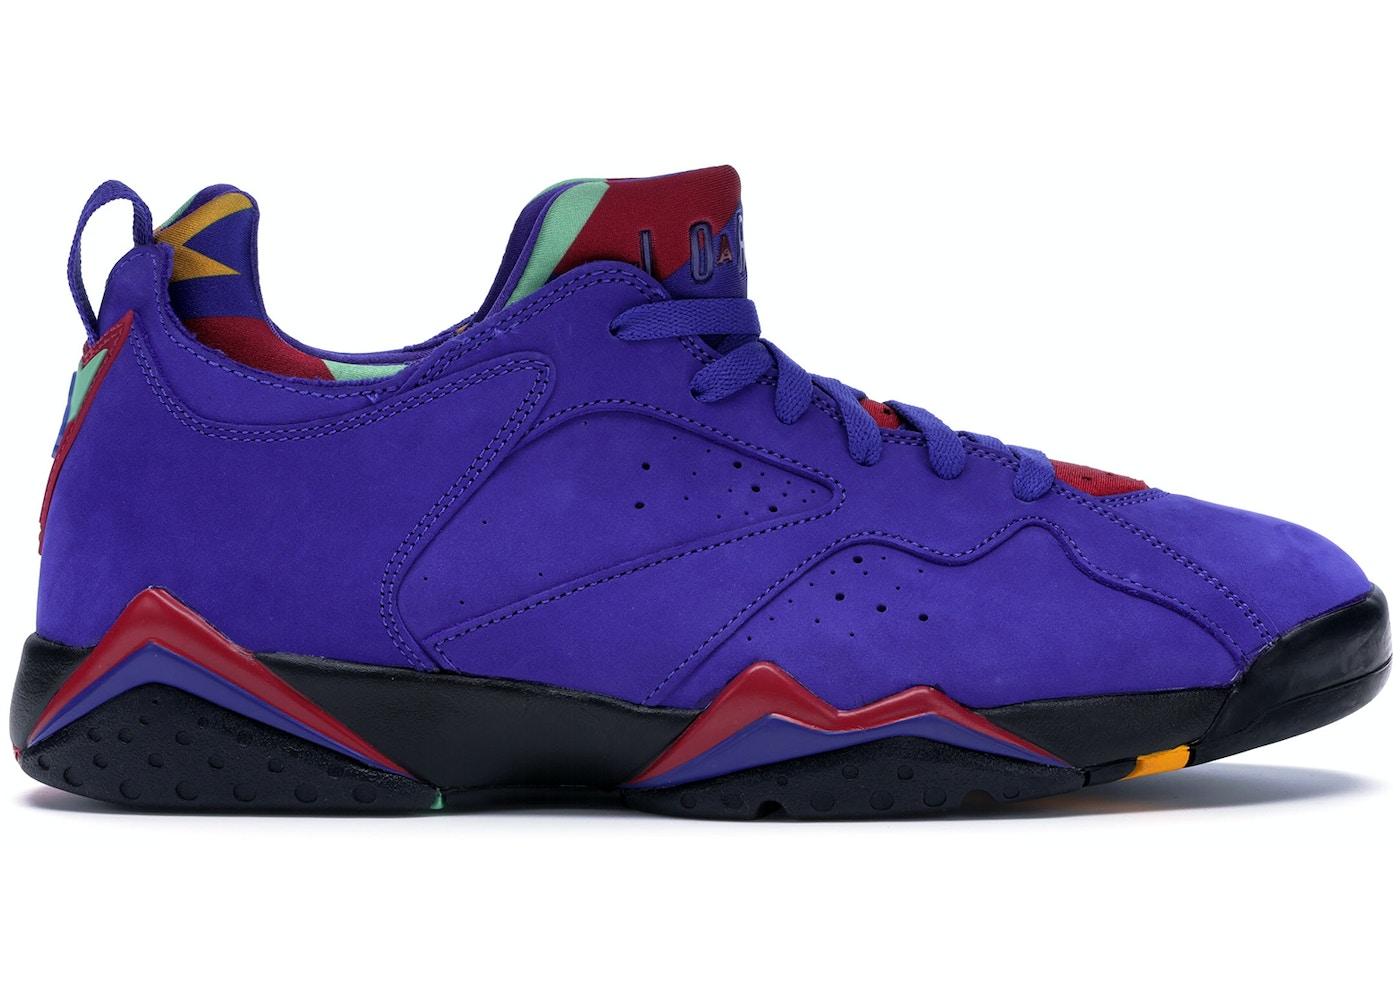 3481b85a27e7c0 Buy Air Jordan 7 Shoes   Deadstock Sneakers